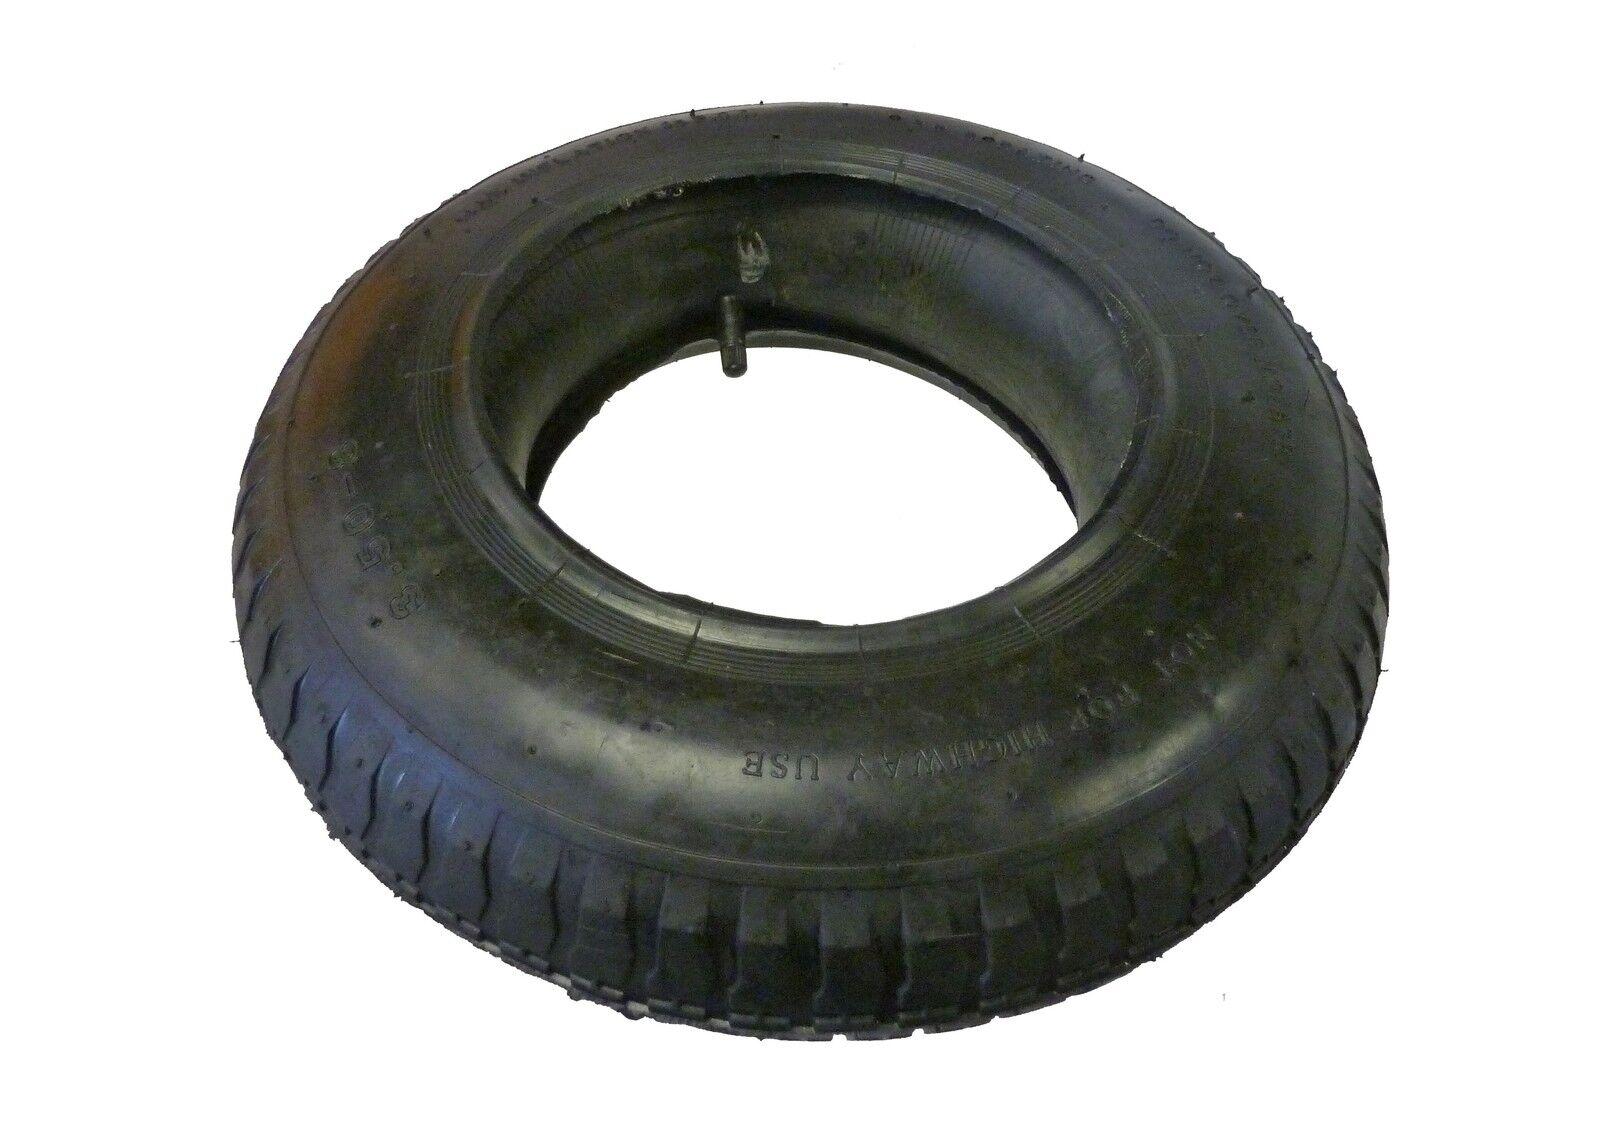 Wheelbarrow replacement tub charcoal gray bath rugs